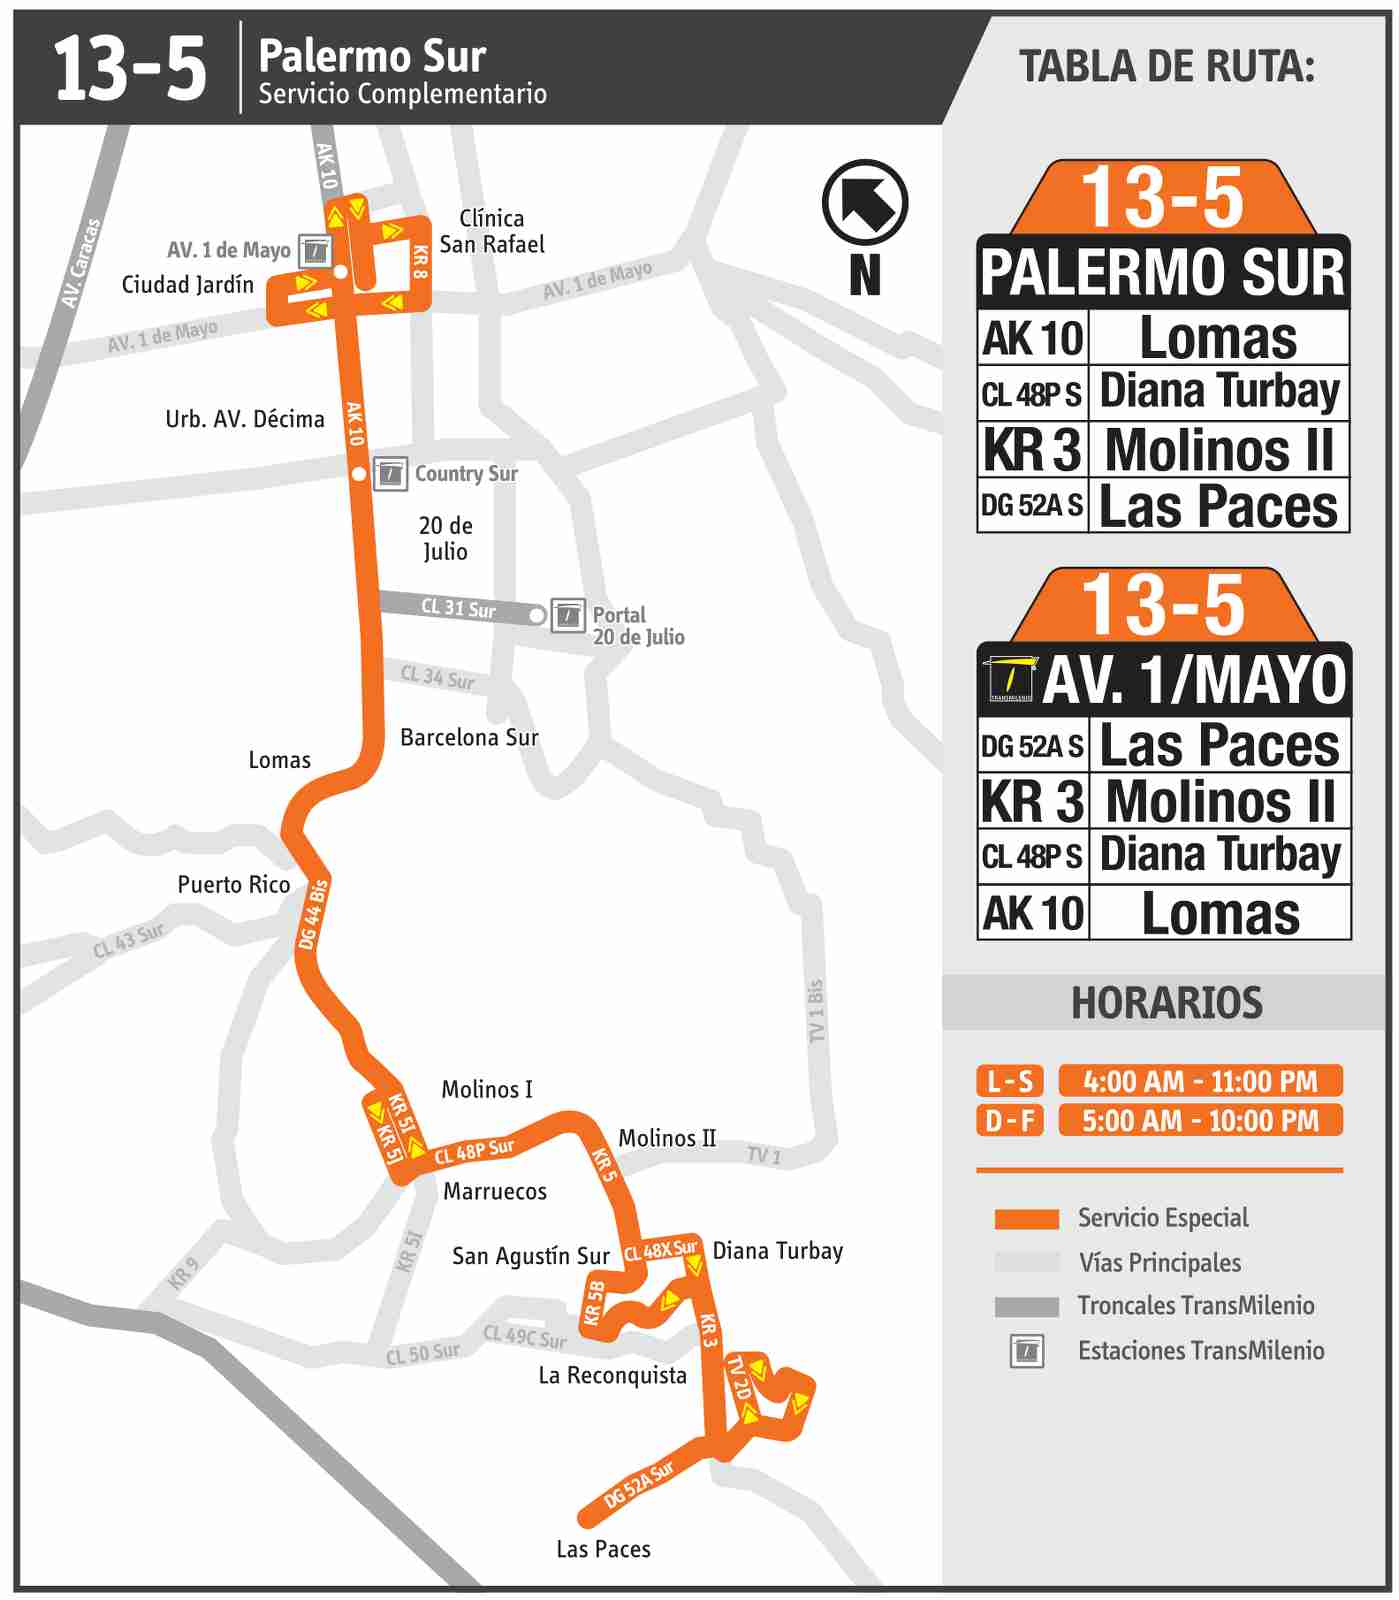 Ruta SITP: 13-5 → Palermo Sur – Avenida 1 Mayo (mapa)